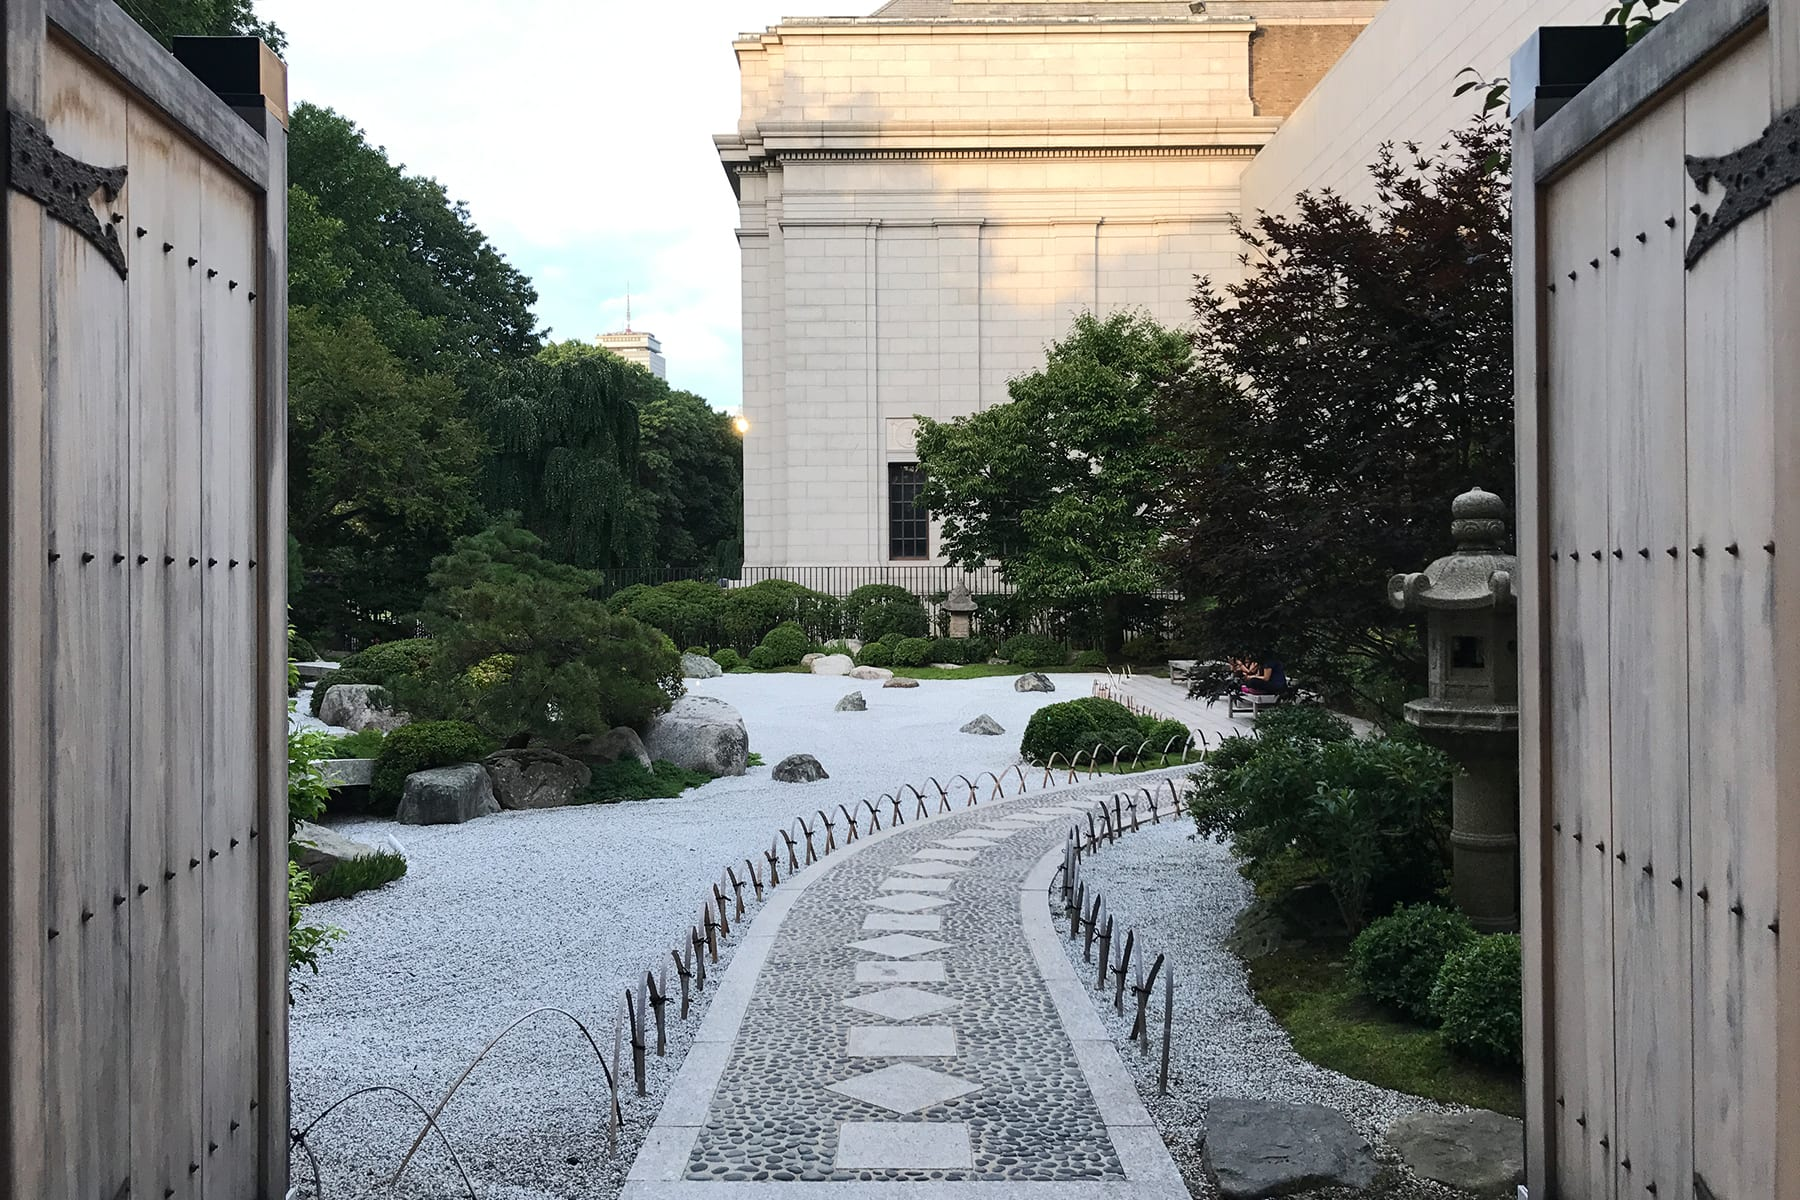 04-MA-journey39-artmuseum-japanesegarden2.jpg